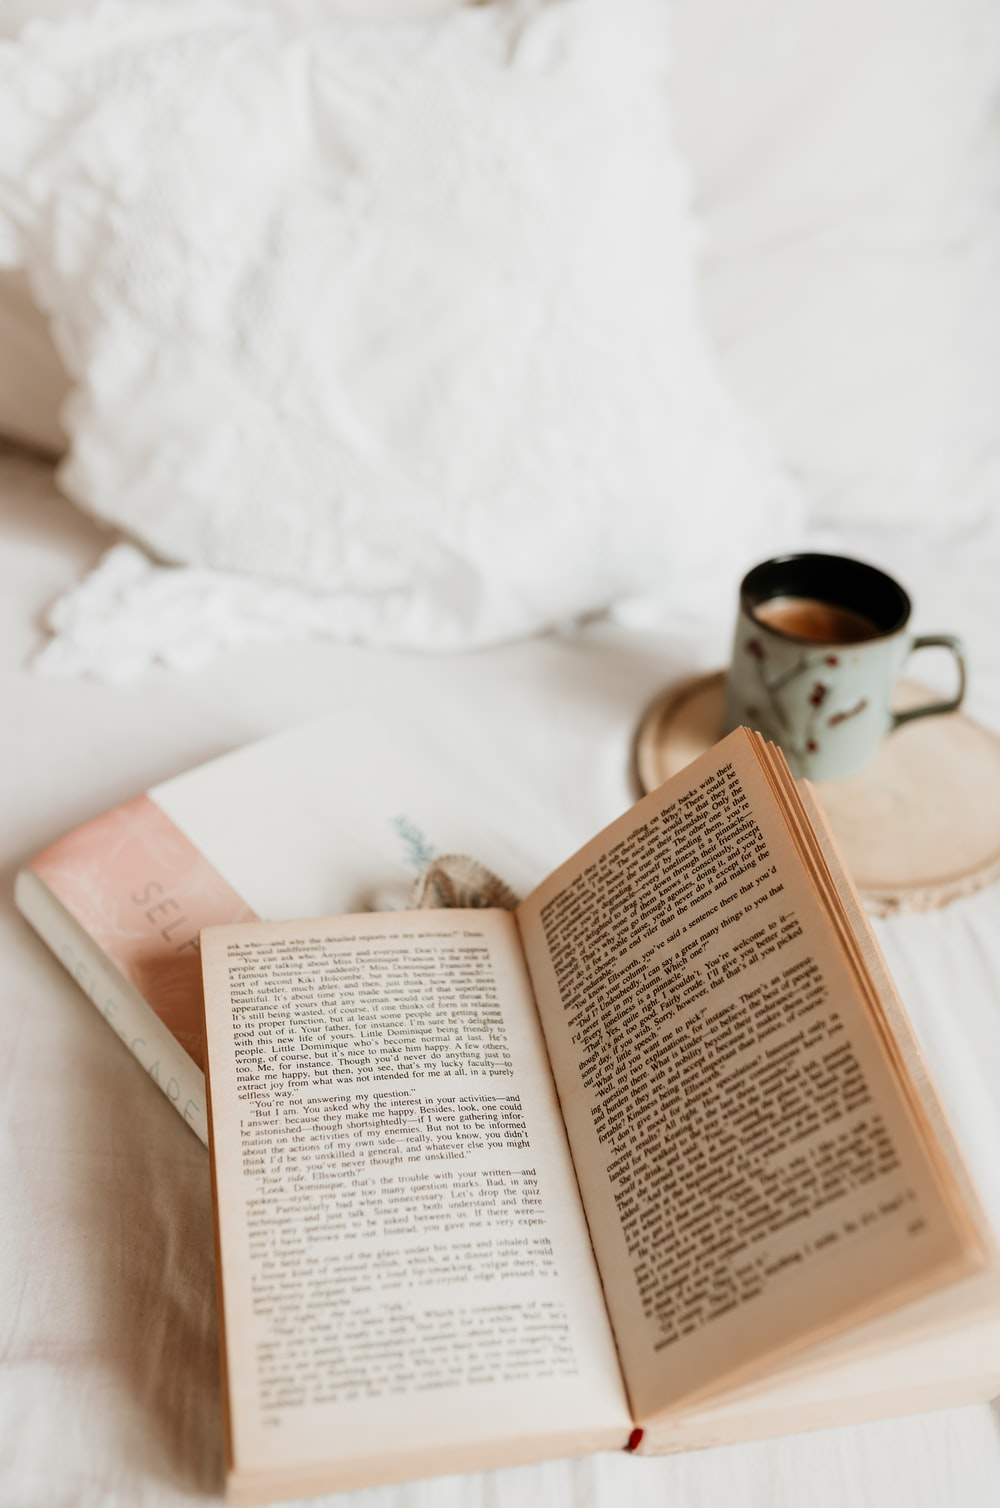 white book page beside white ceramic mug